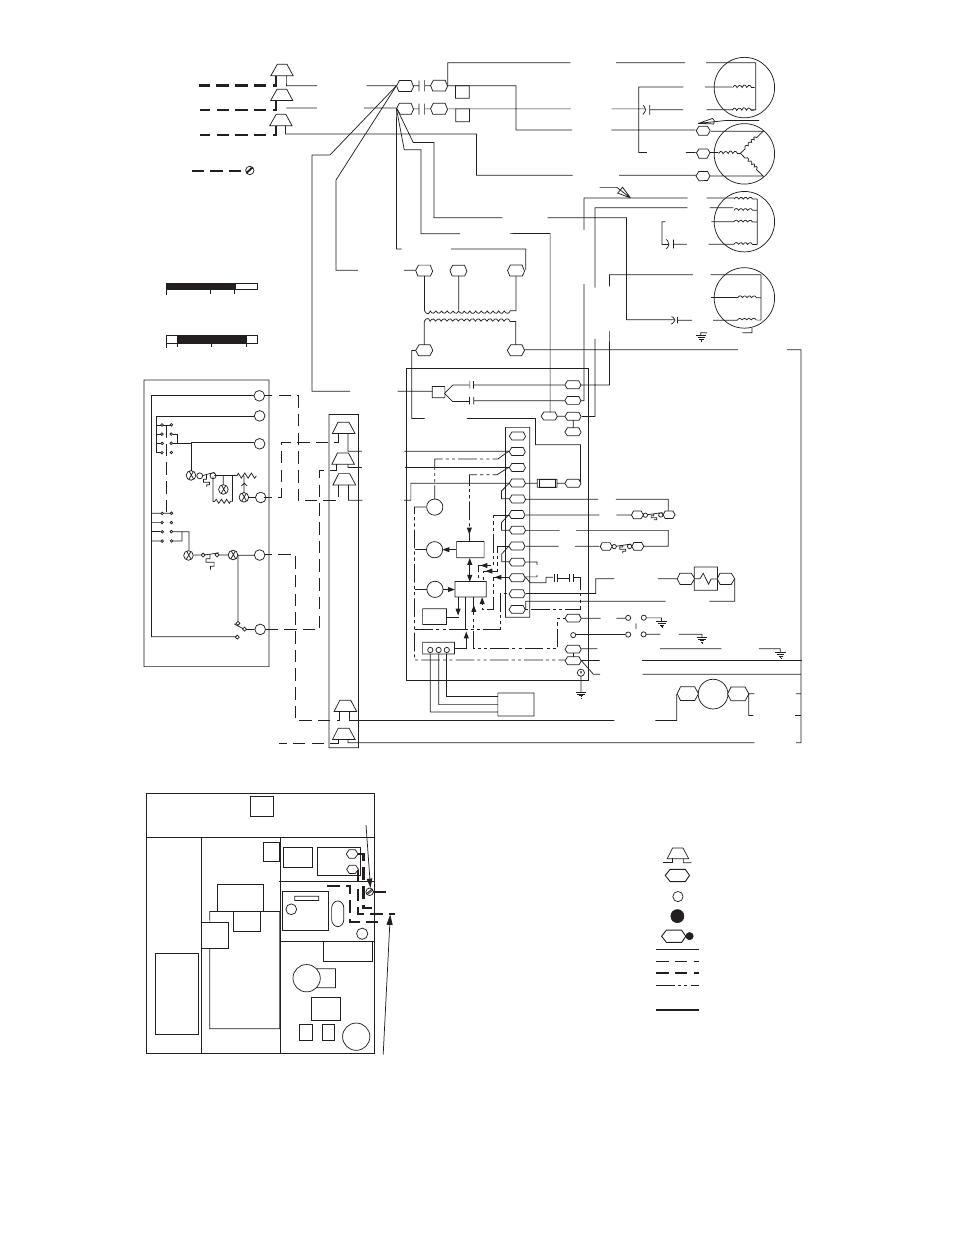 bryant 582a user manual